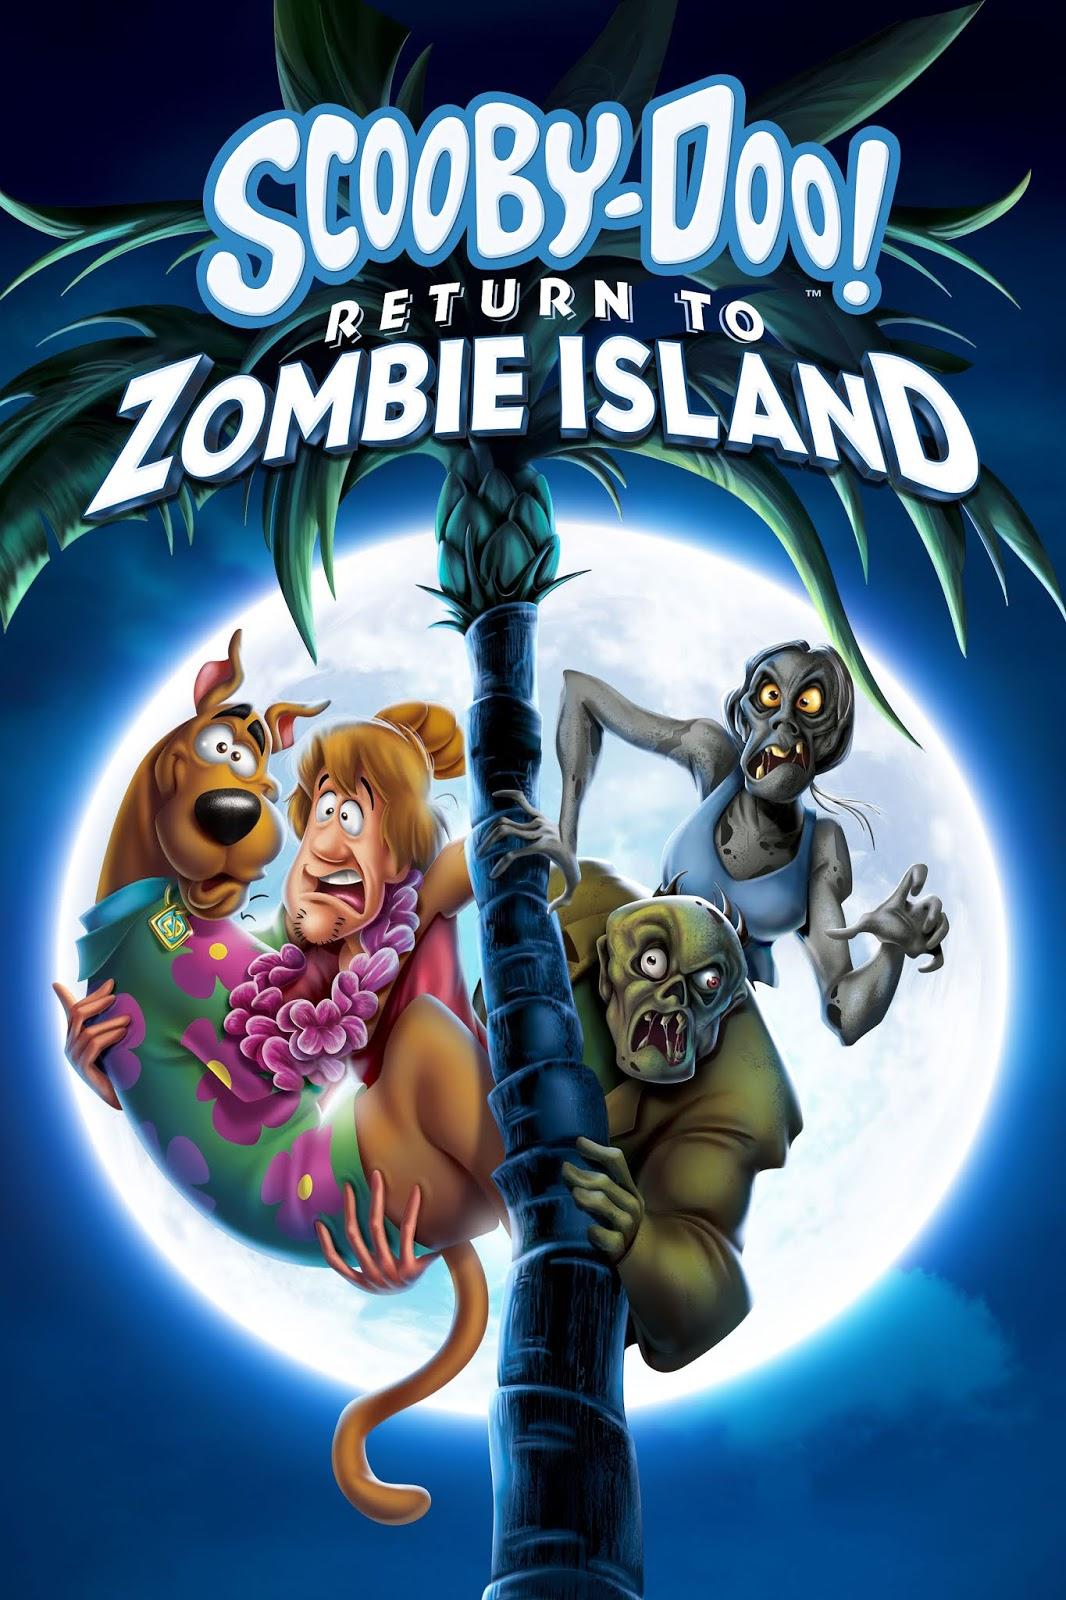 Scooby-Doo: Return to Zombie Island [2019] [DVDR] [NTSC] [Latino]